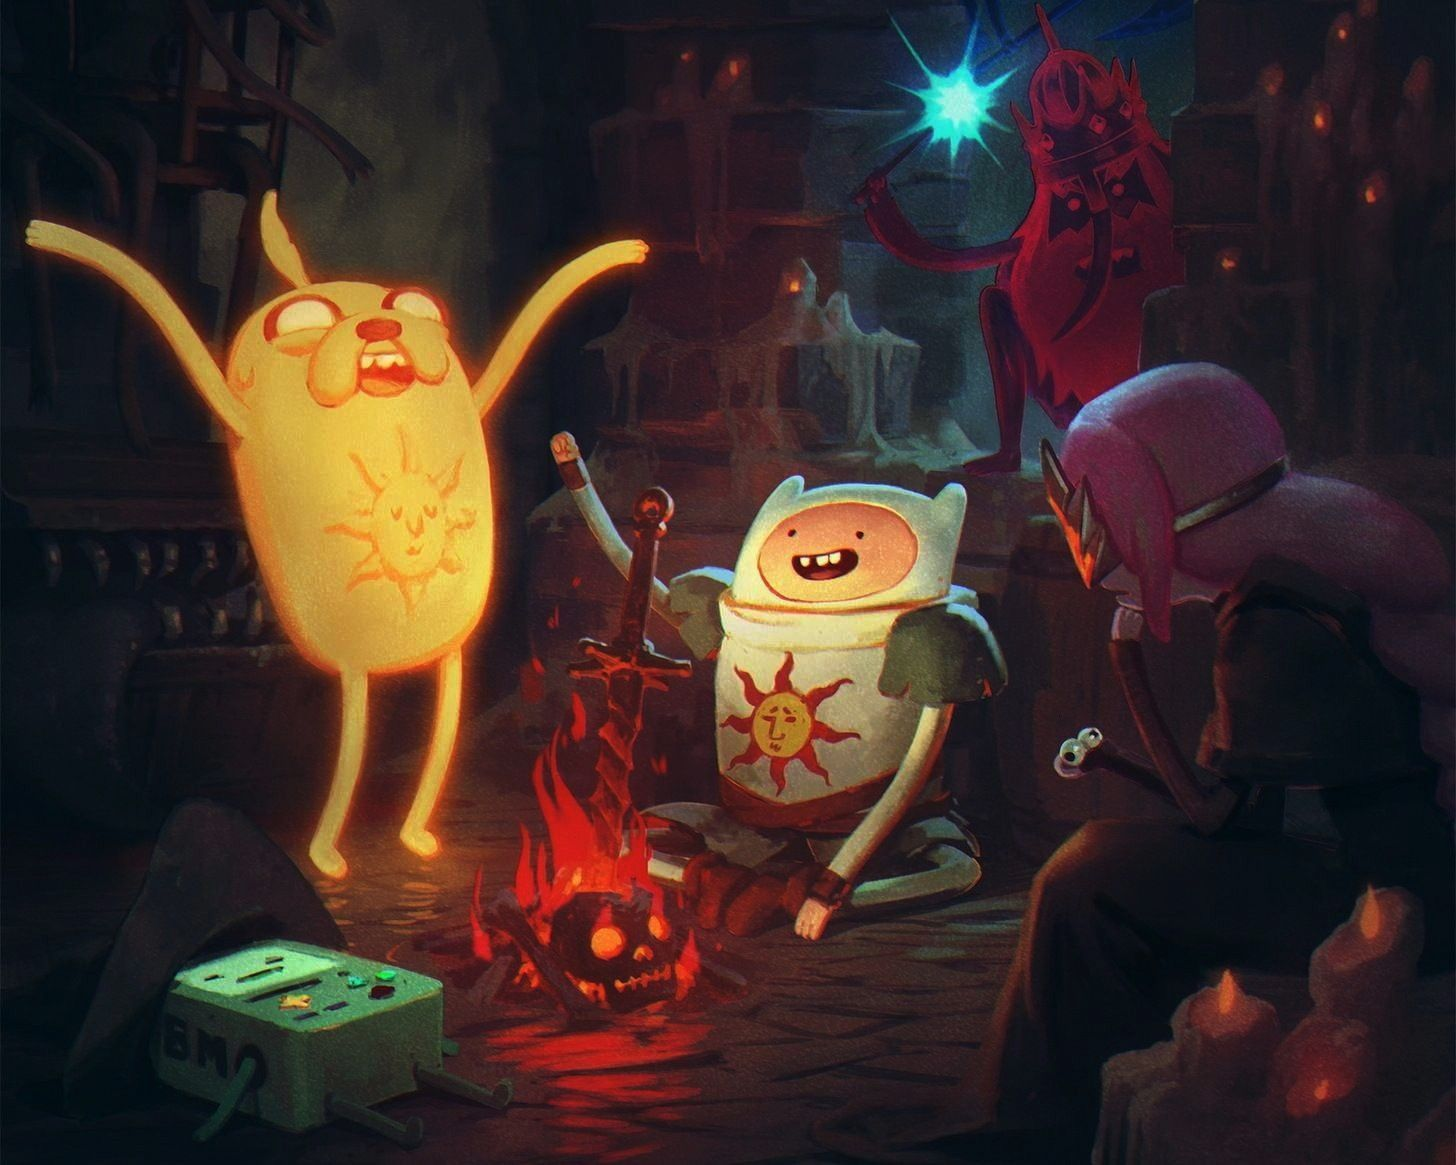 Wallpapers 040 Adventure Time, Game of Thrones, Luke Cage, Star Wars Rebels, Stranger Things, Super